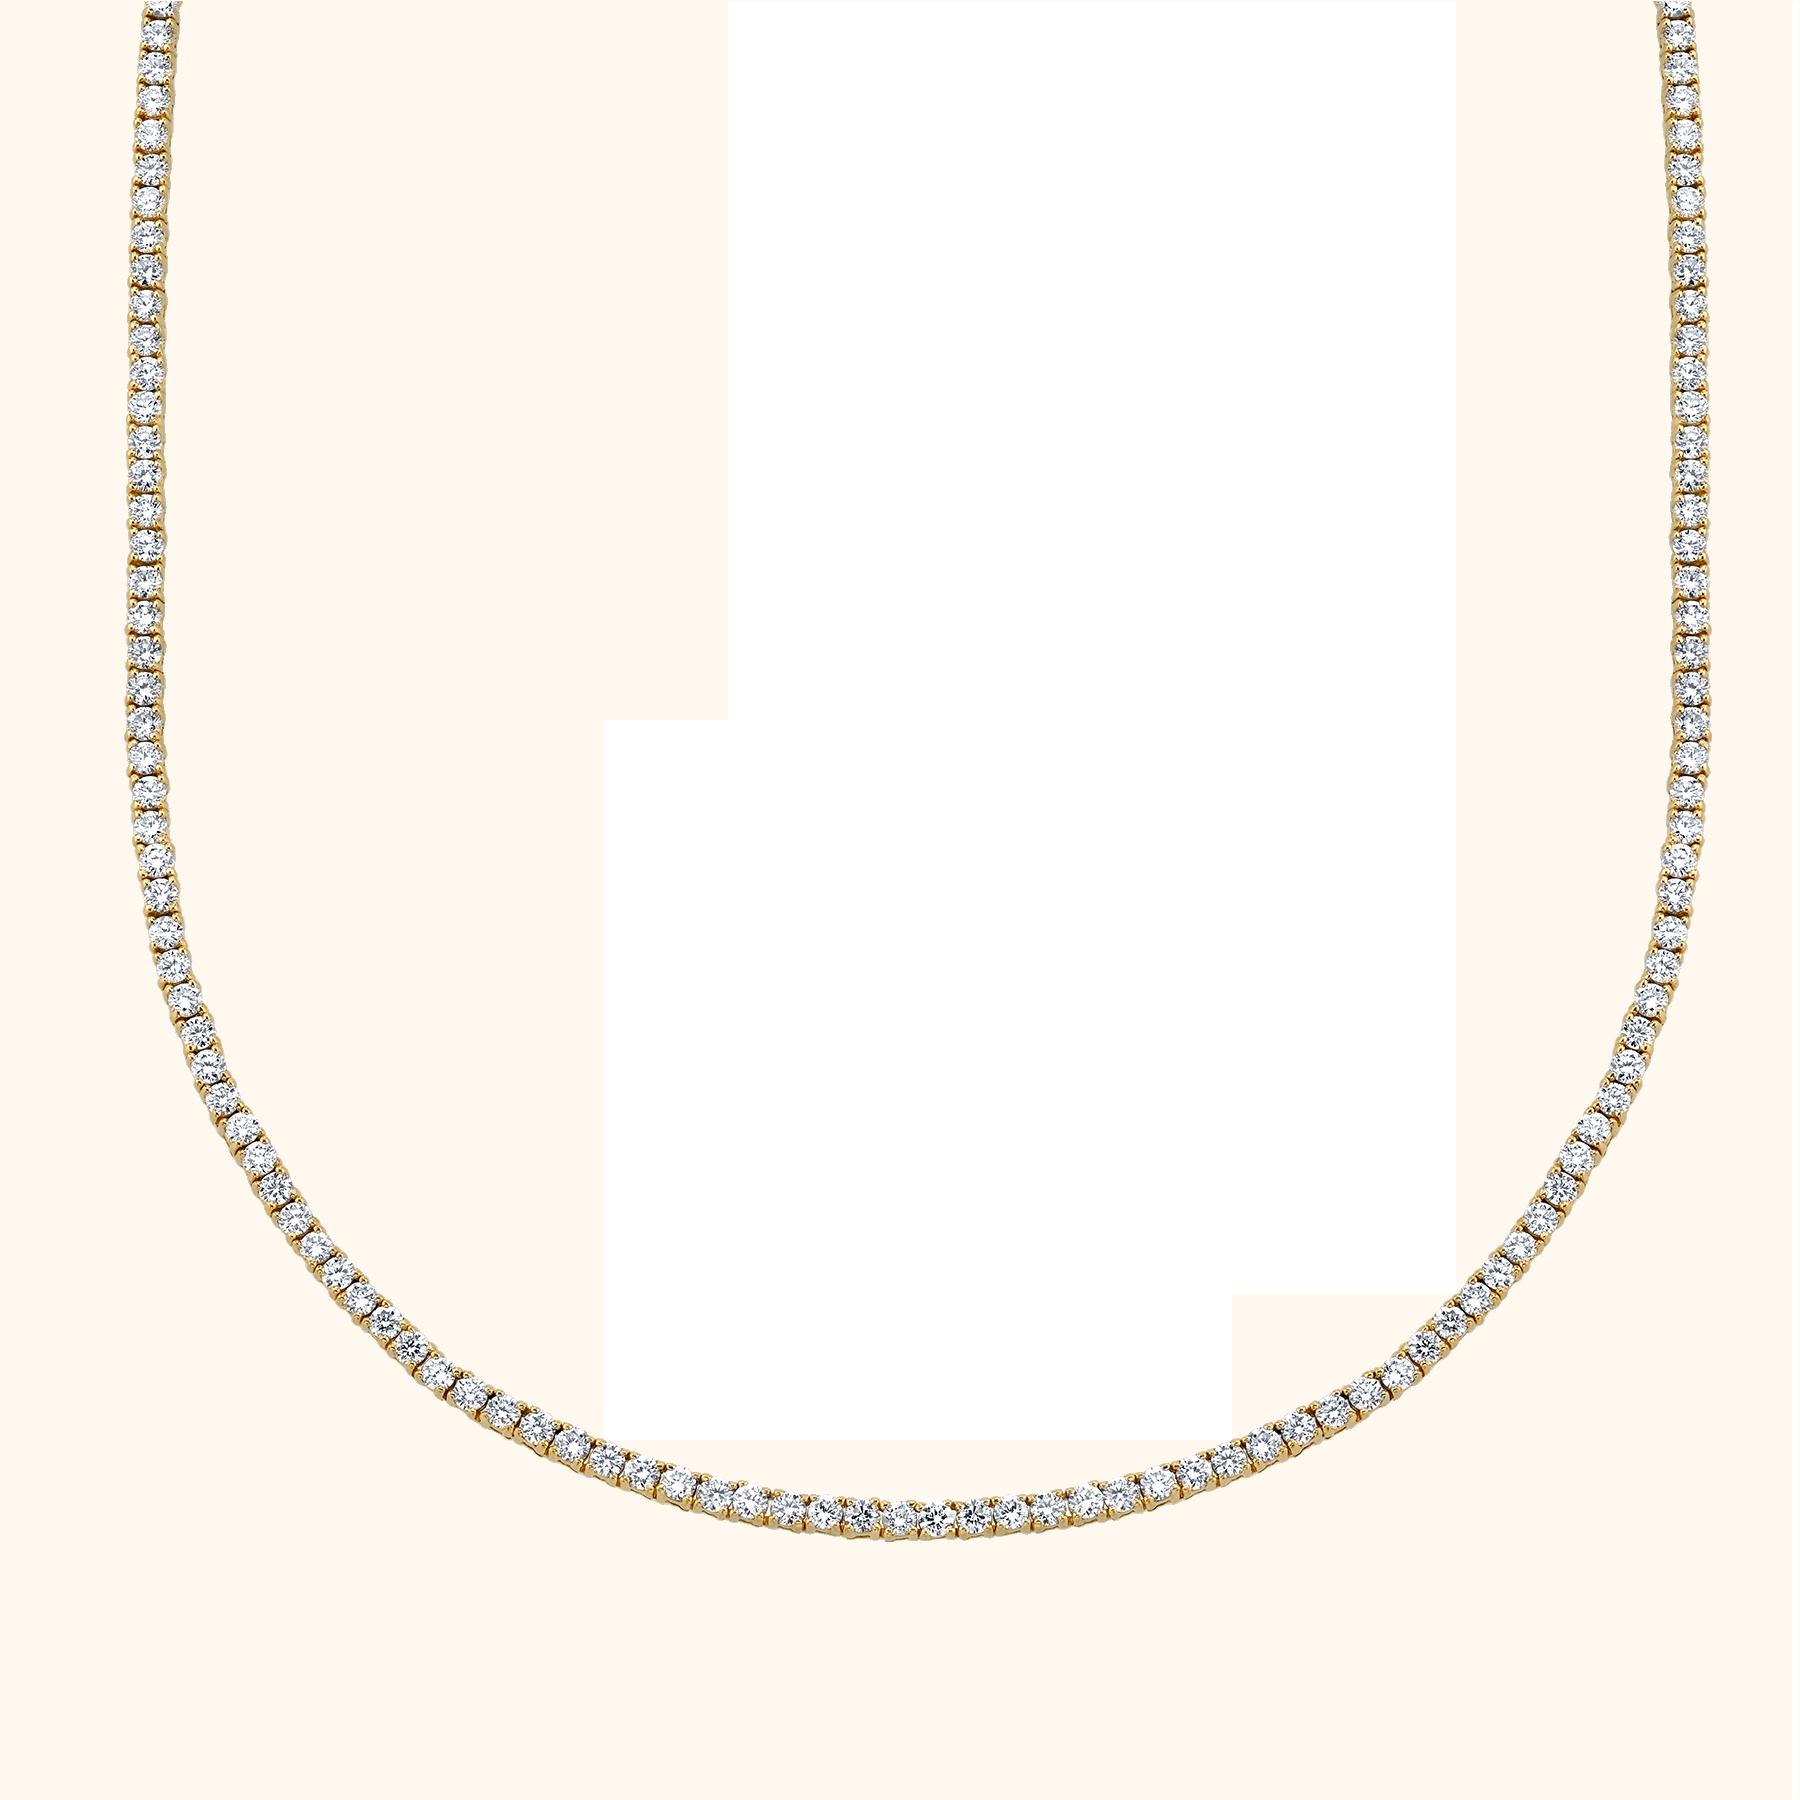 PERFECT DIAMOND COLLAR TENNIS NECKLACE